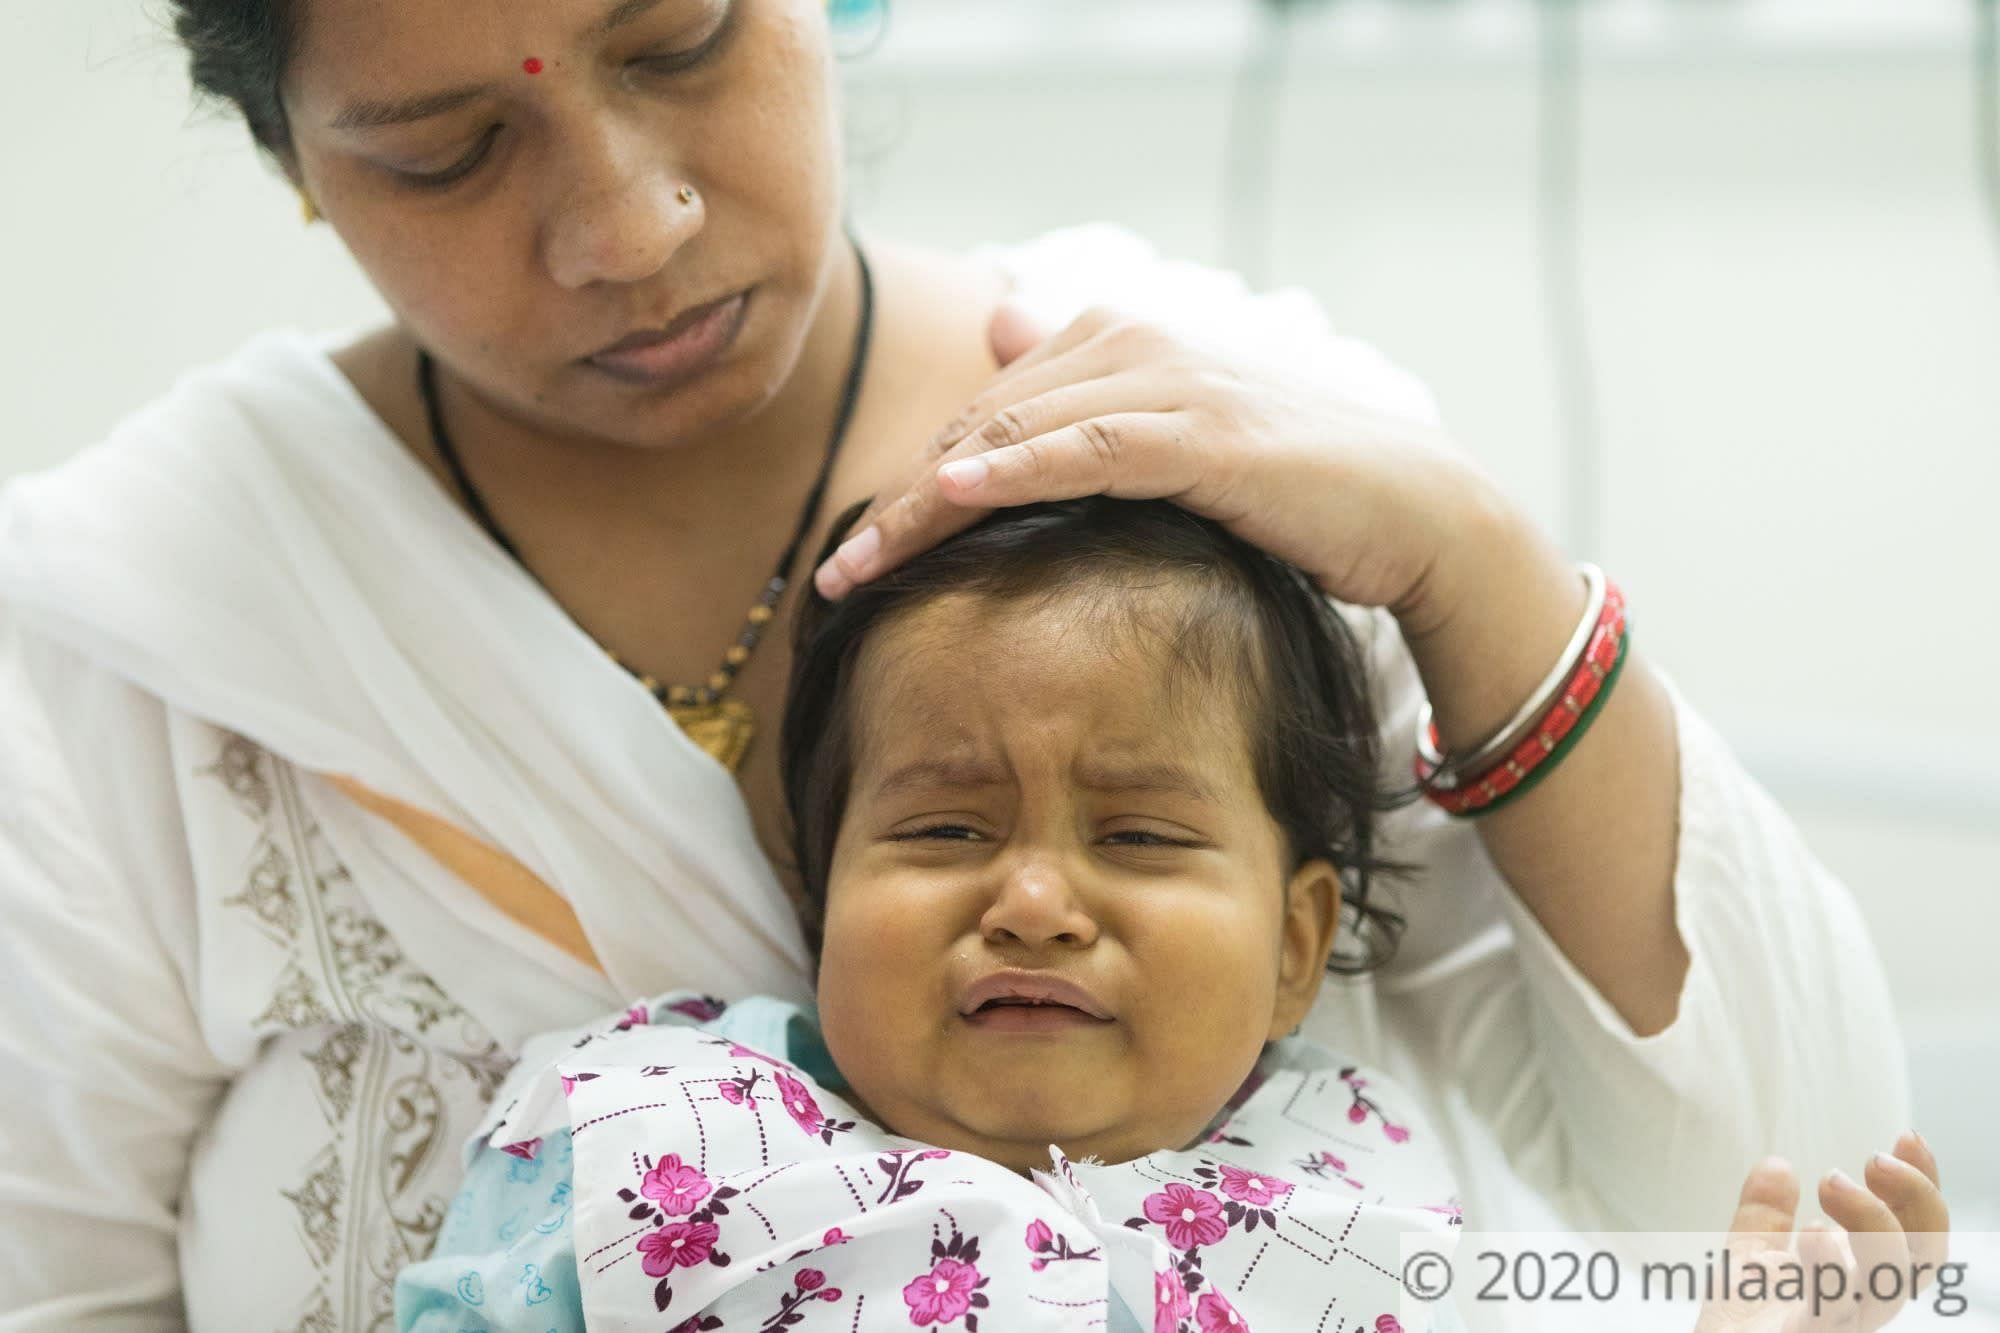 Shivansh 20 rja8gr 1575640978